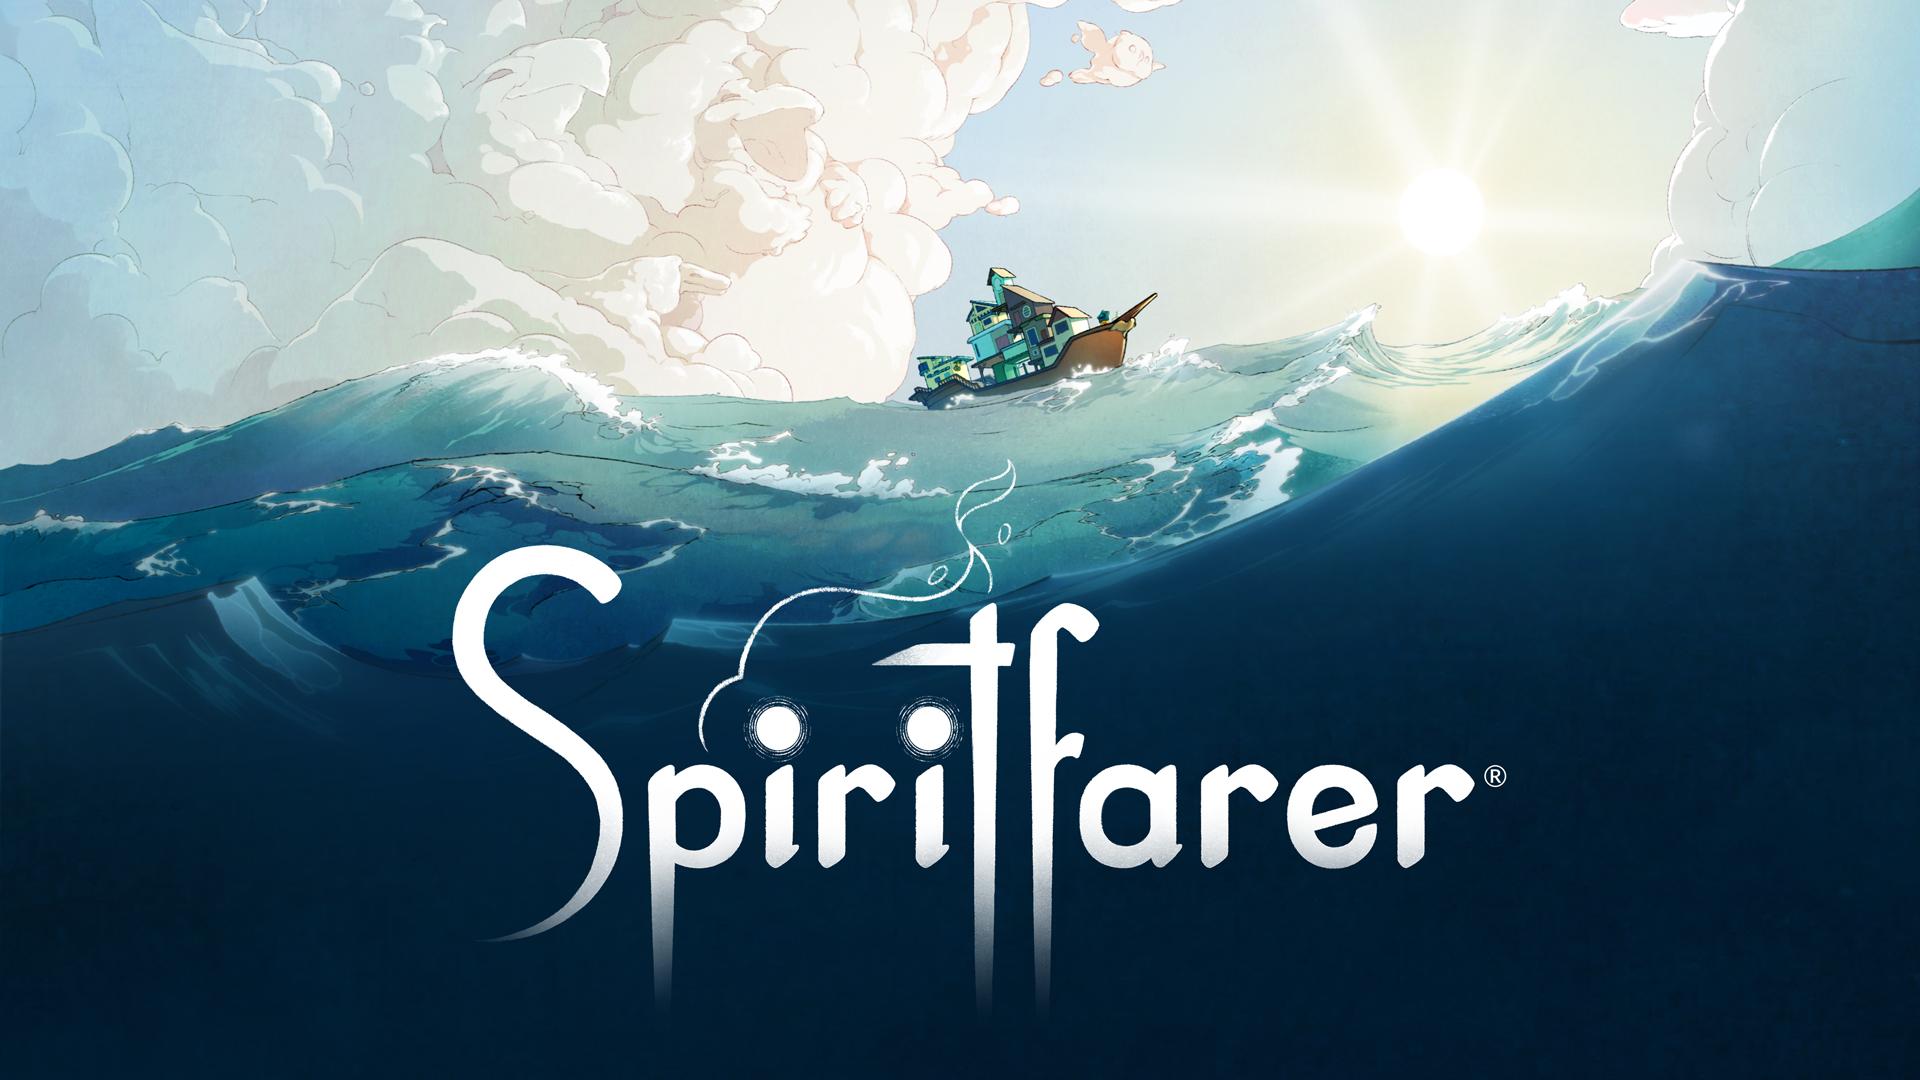 Spiritfarer Keyart